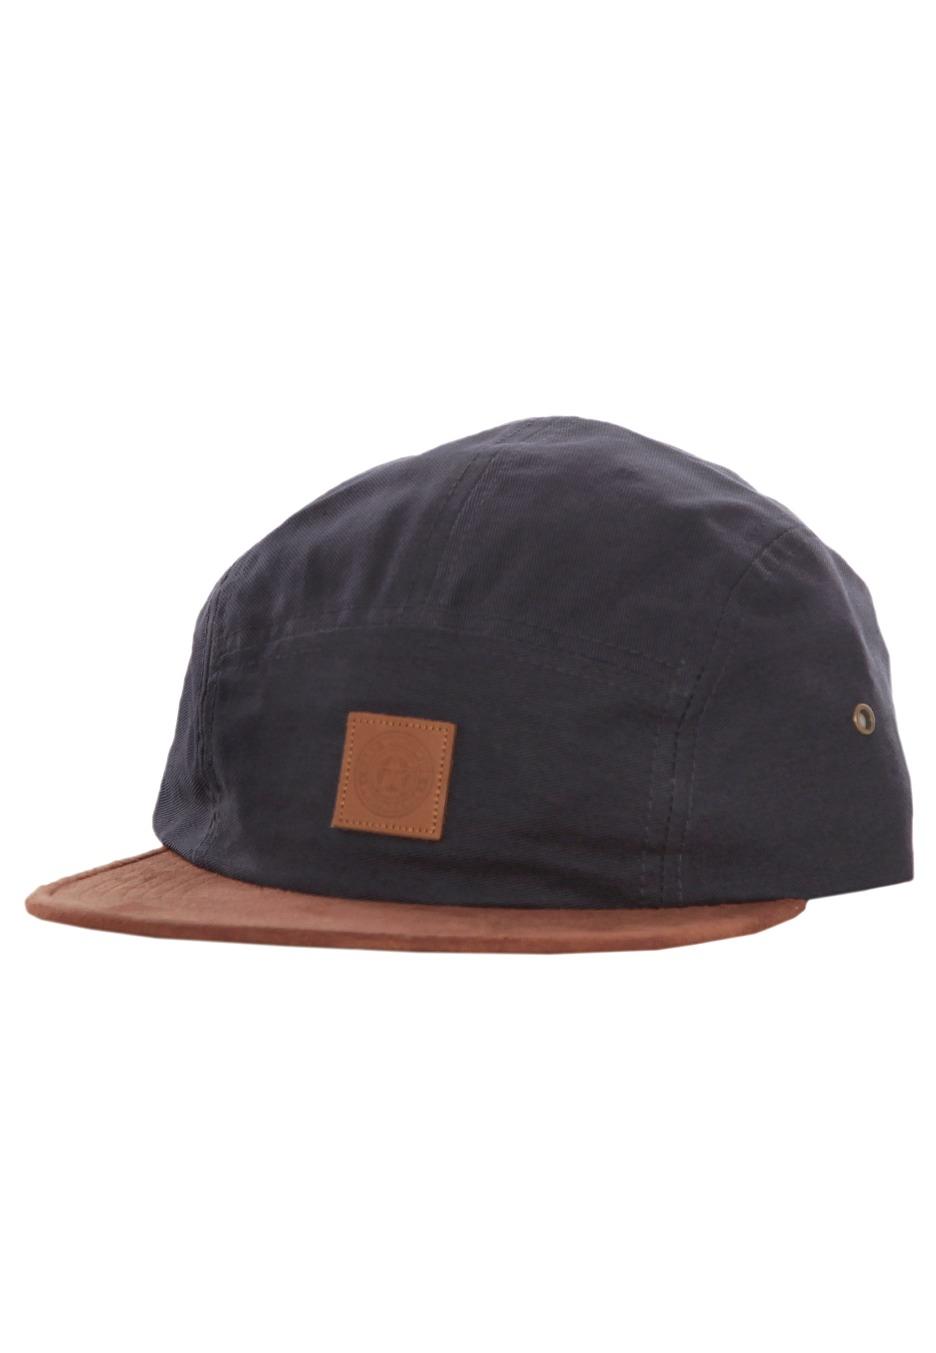 Obey - Stockholm Navy - Cap - Streetwear Shop - Impericon.com Worldwide a3bbe28b2a15b